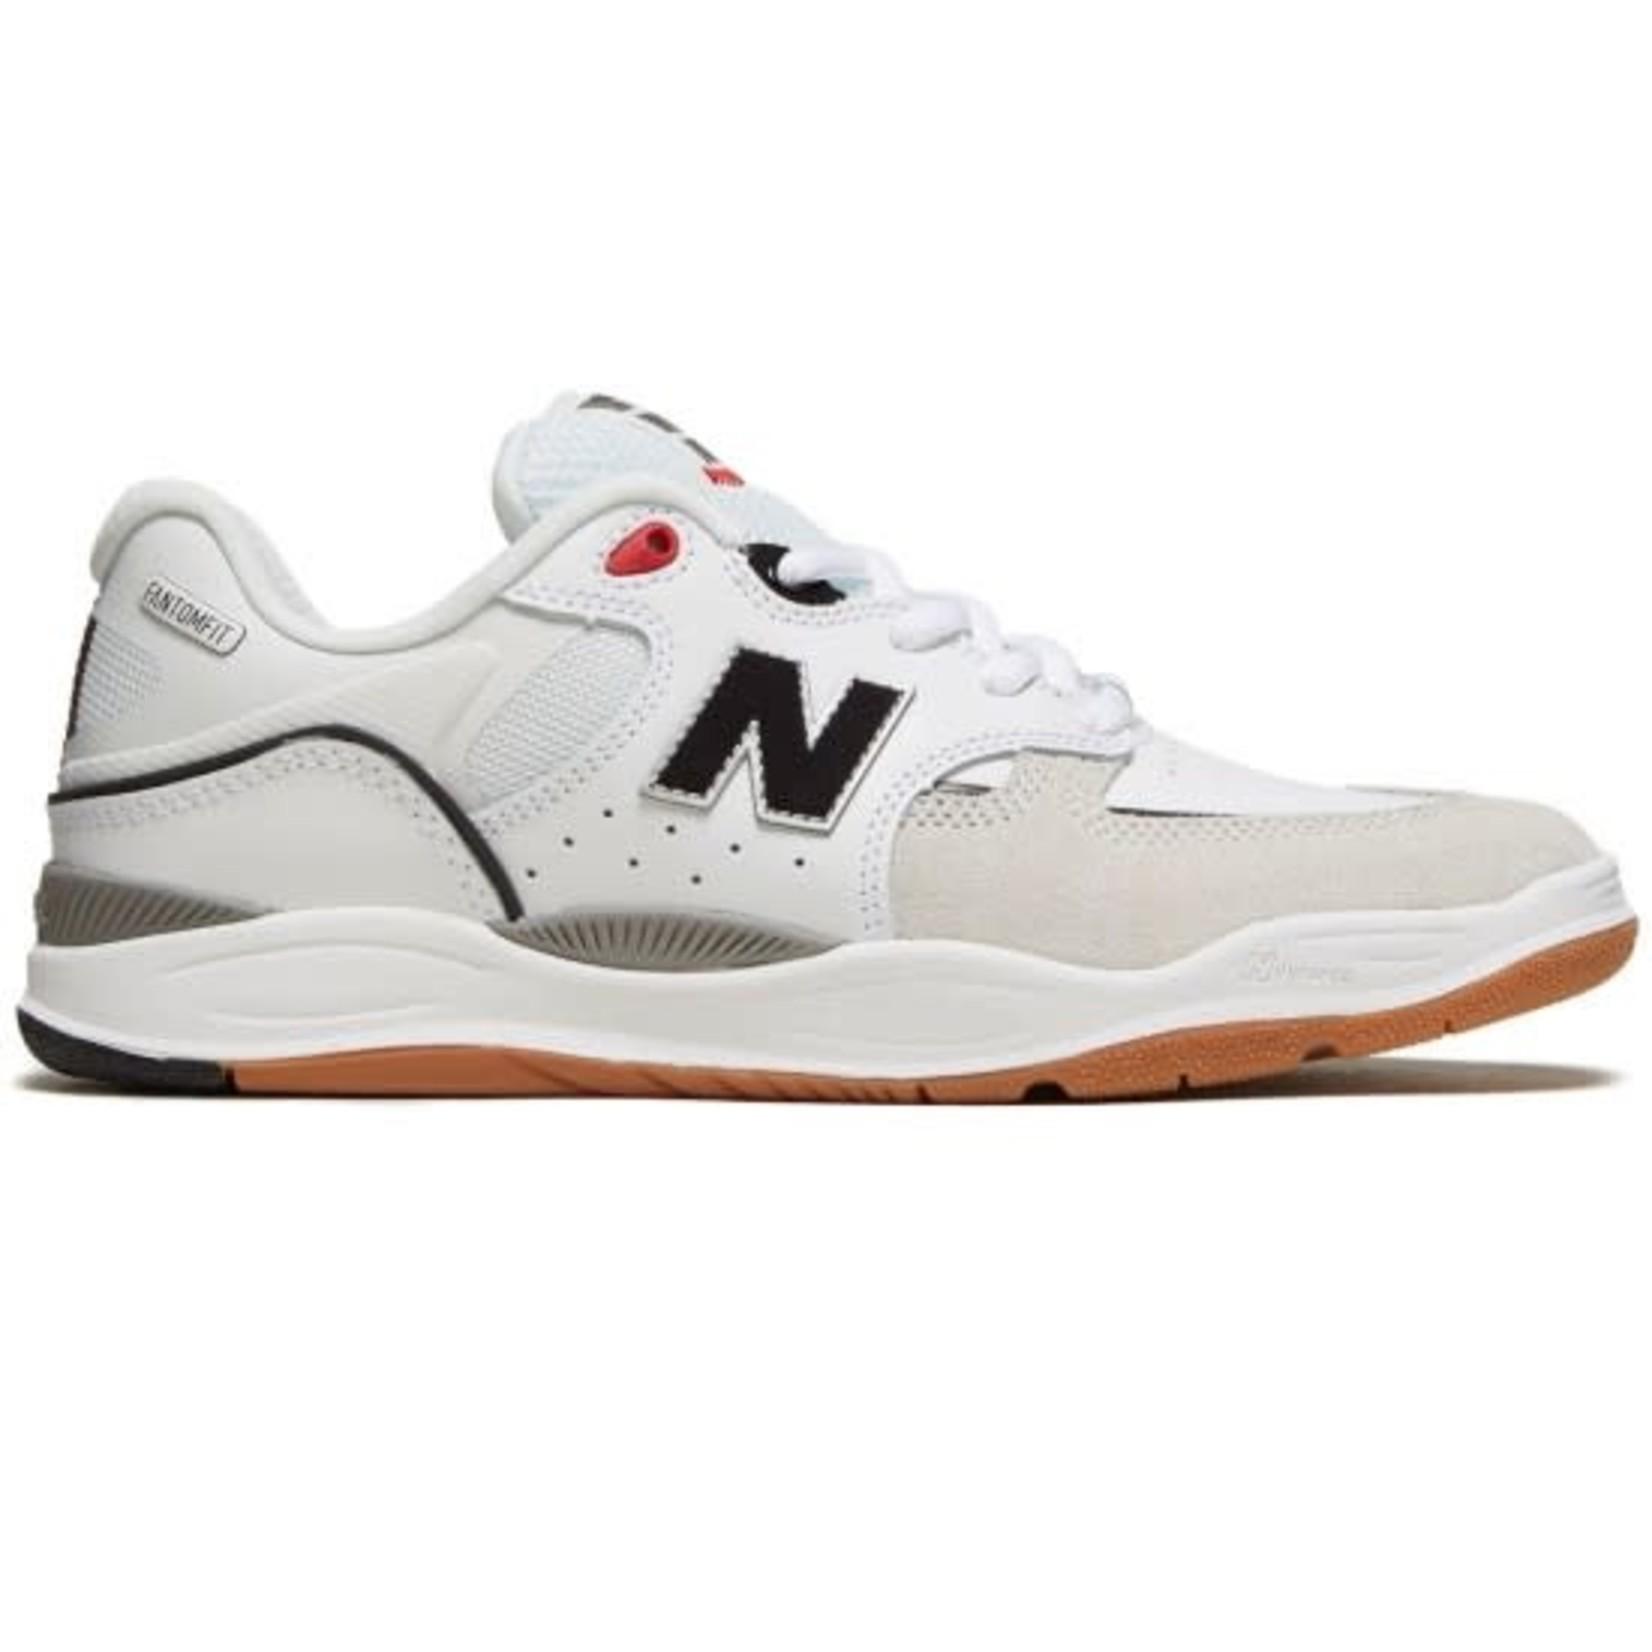 New Balance New Balance Numeric 1010